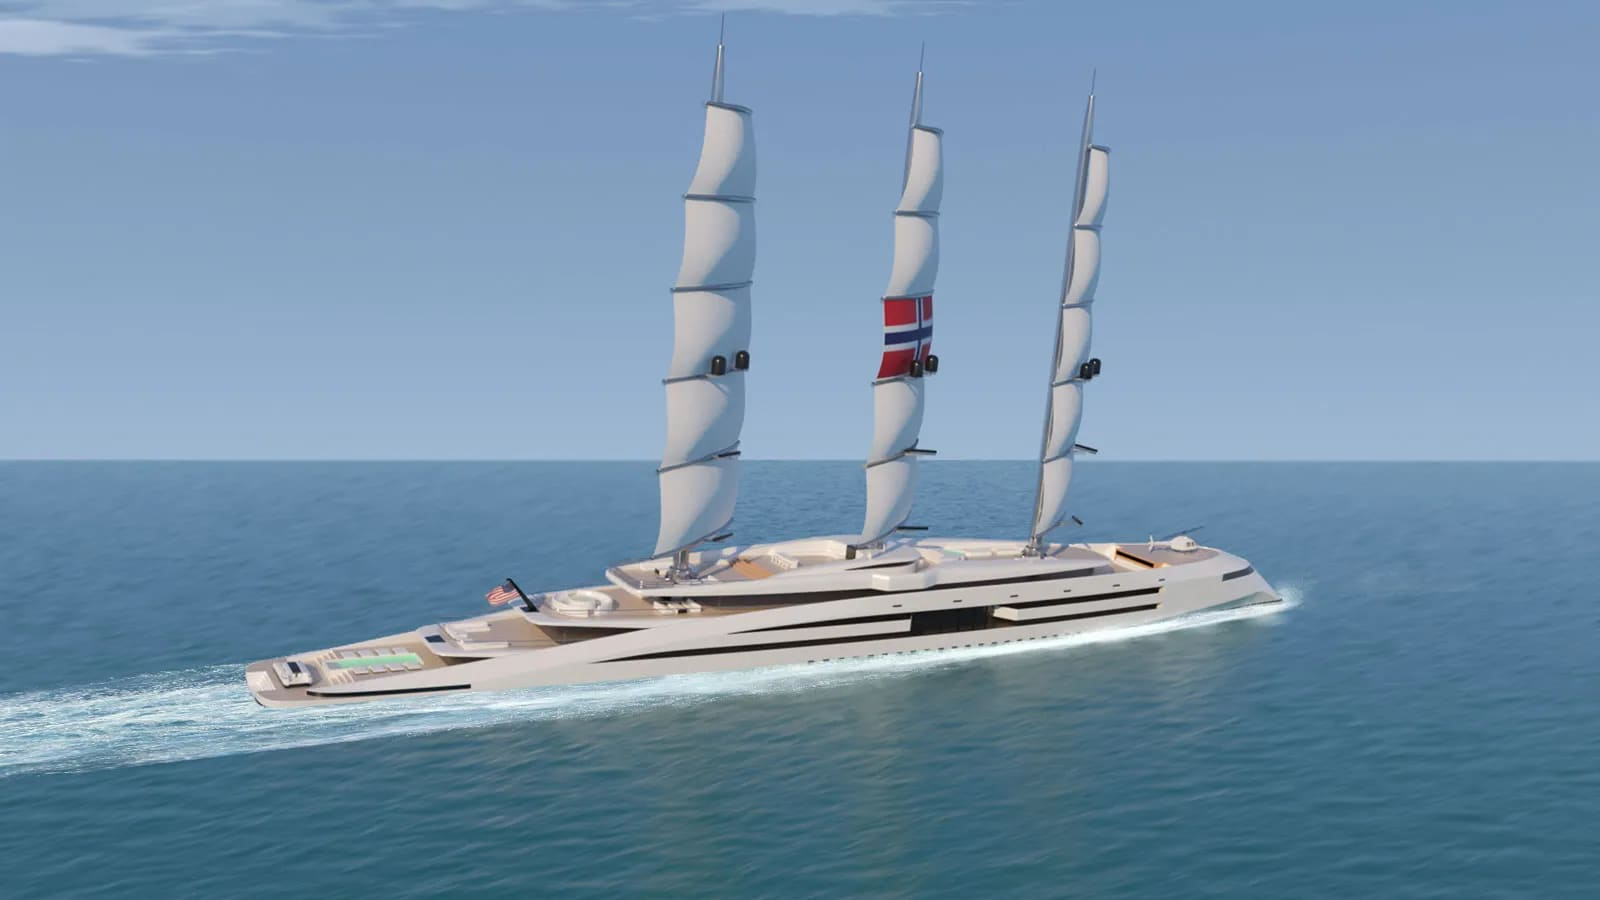 superiate-noruega-boat-shopping-2